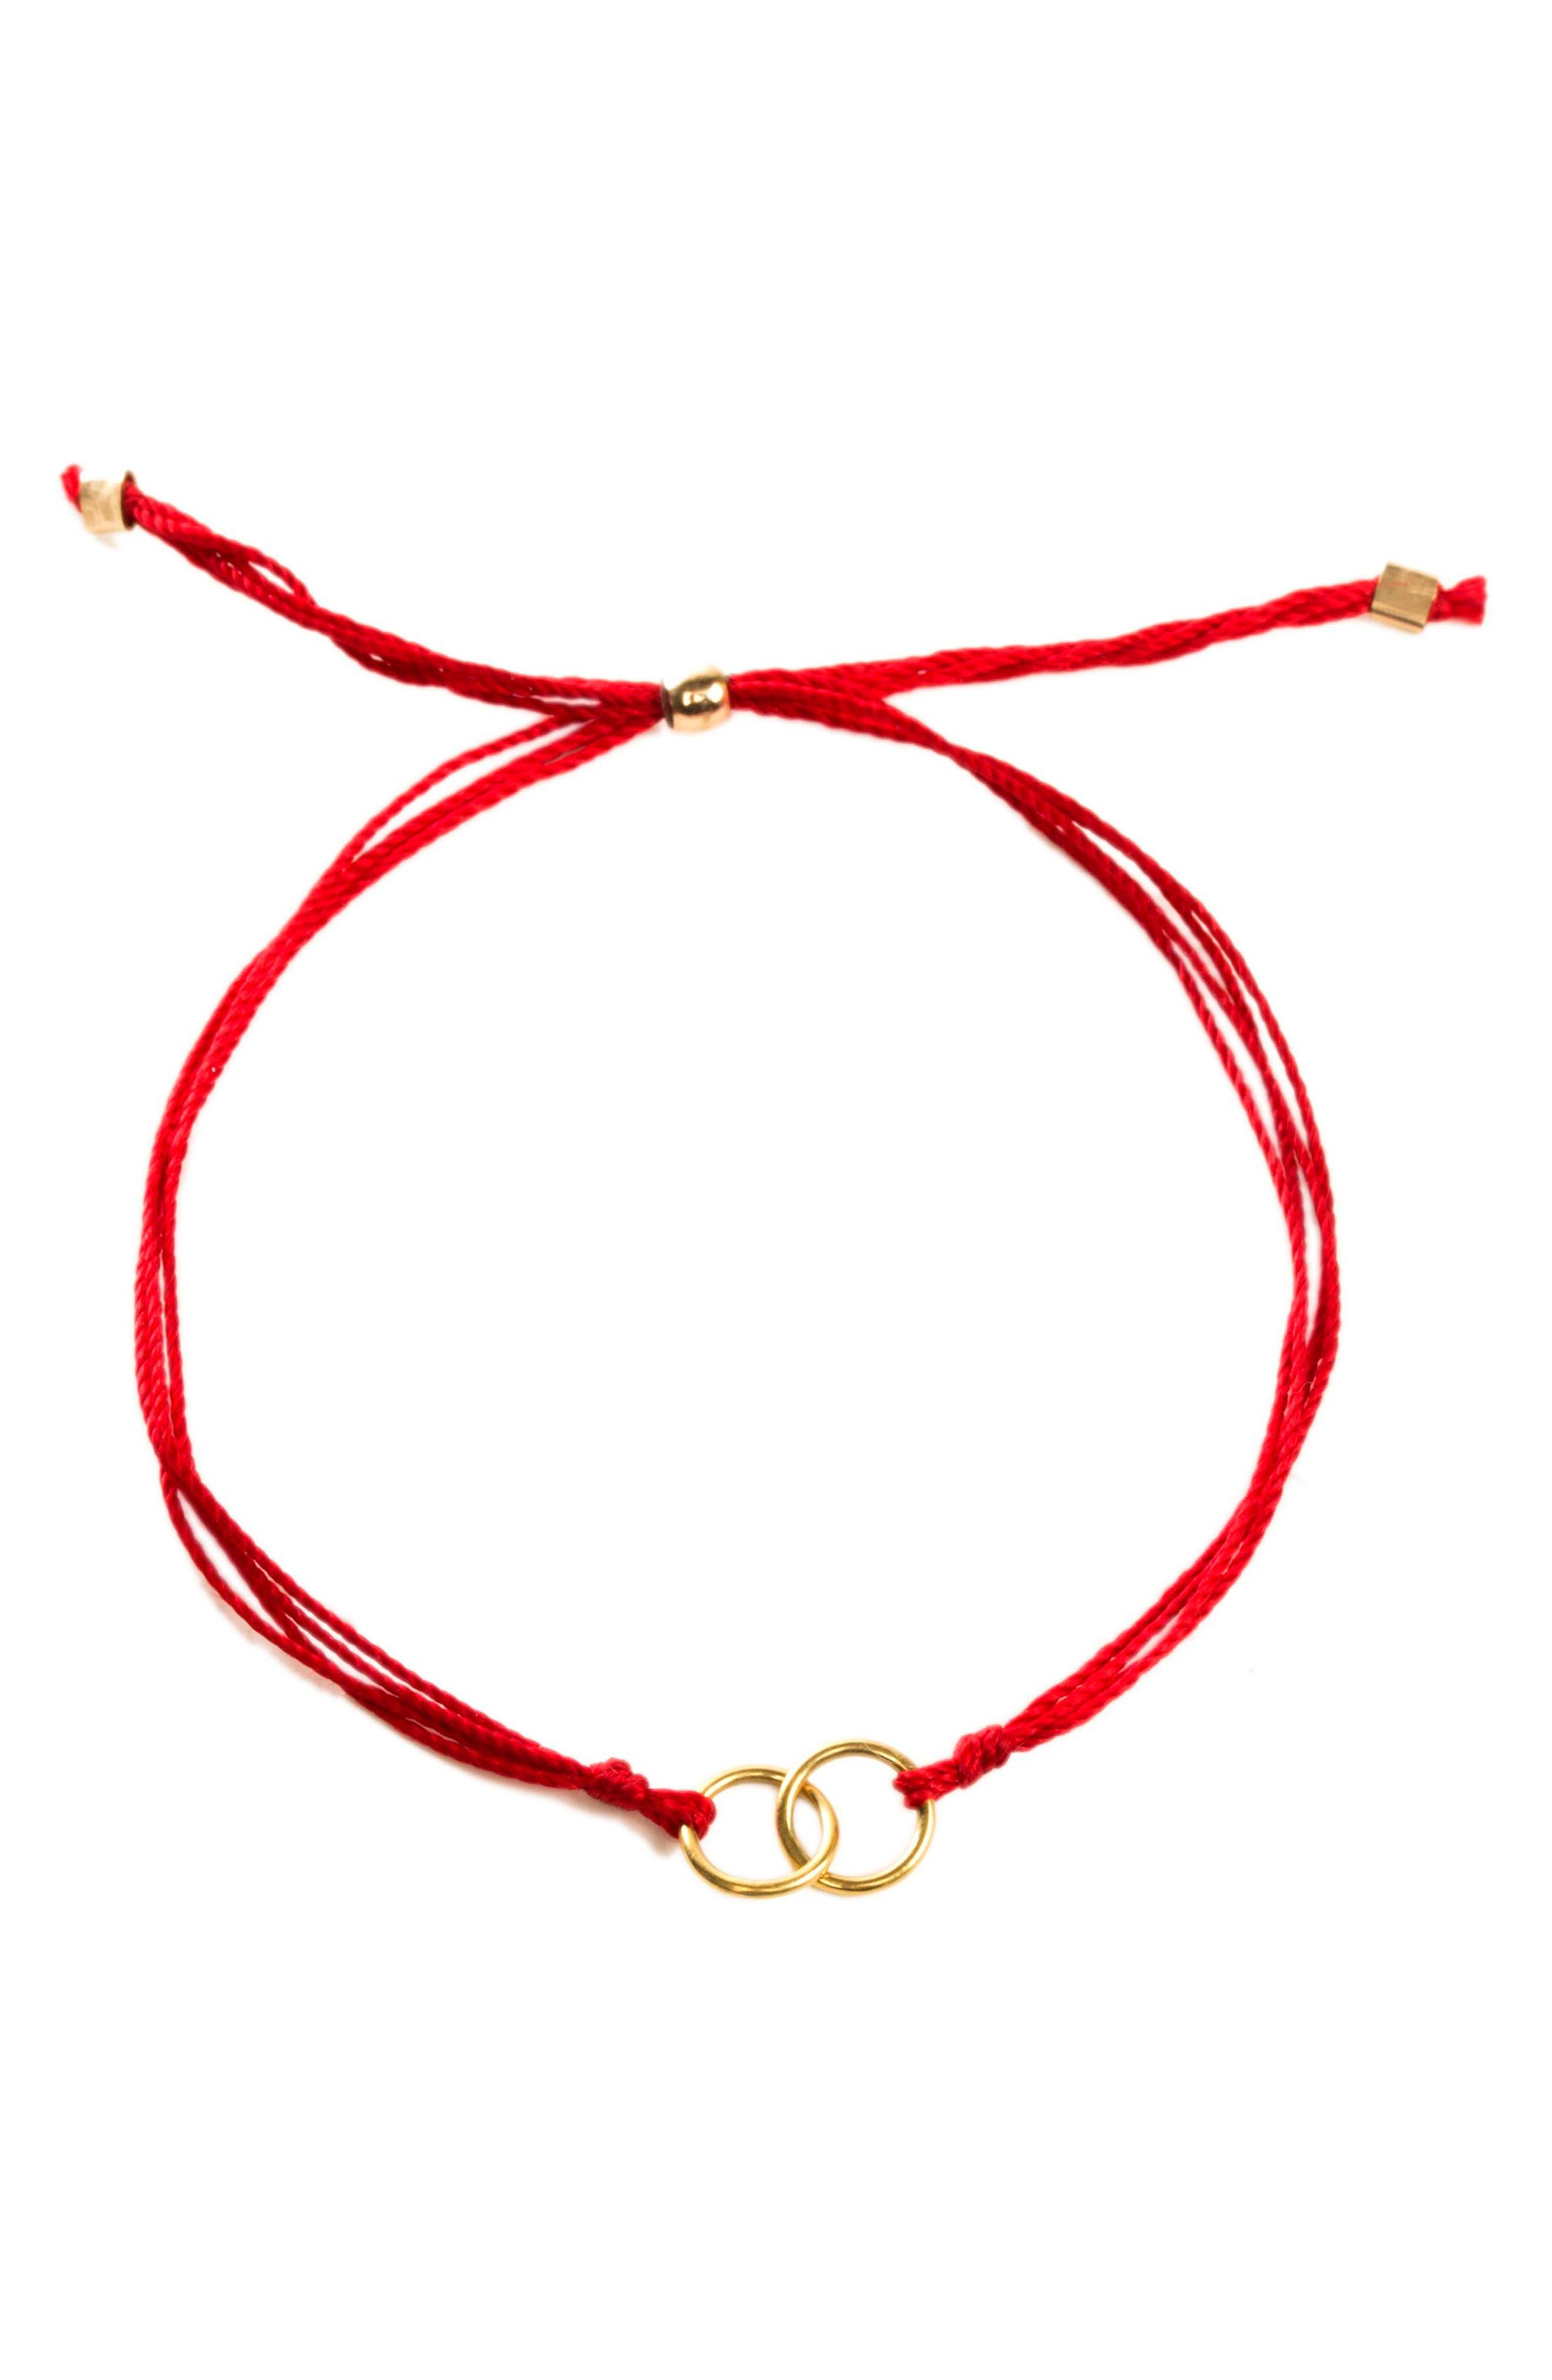 Double Linked Friendship Bracelet,                             Alternate thumbnail 2, color,                             RED / GOLD